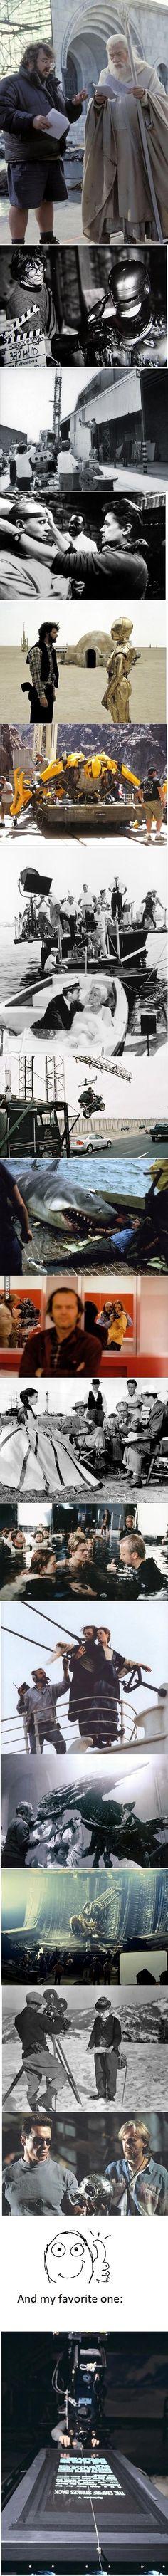 Behind some epic scenes